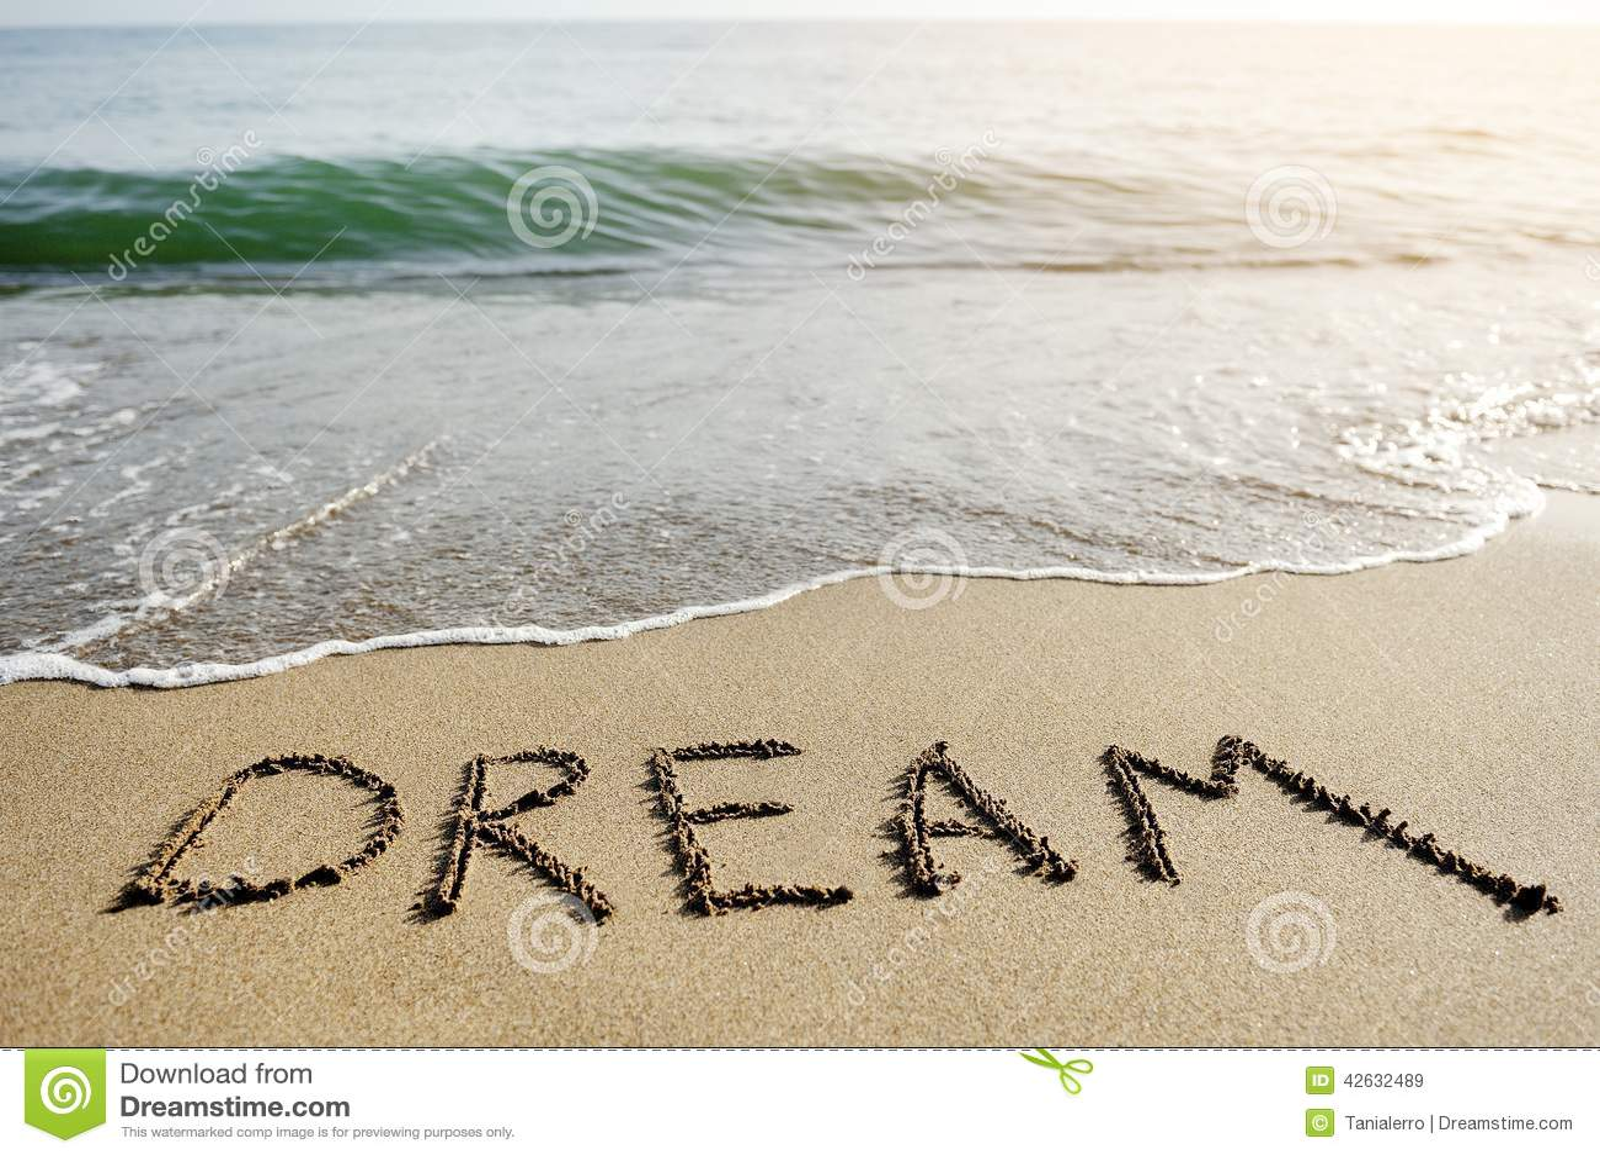 Dream word written on beach sand - positive thinking concept